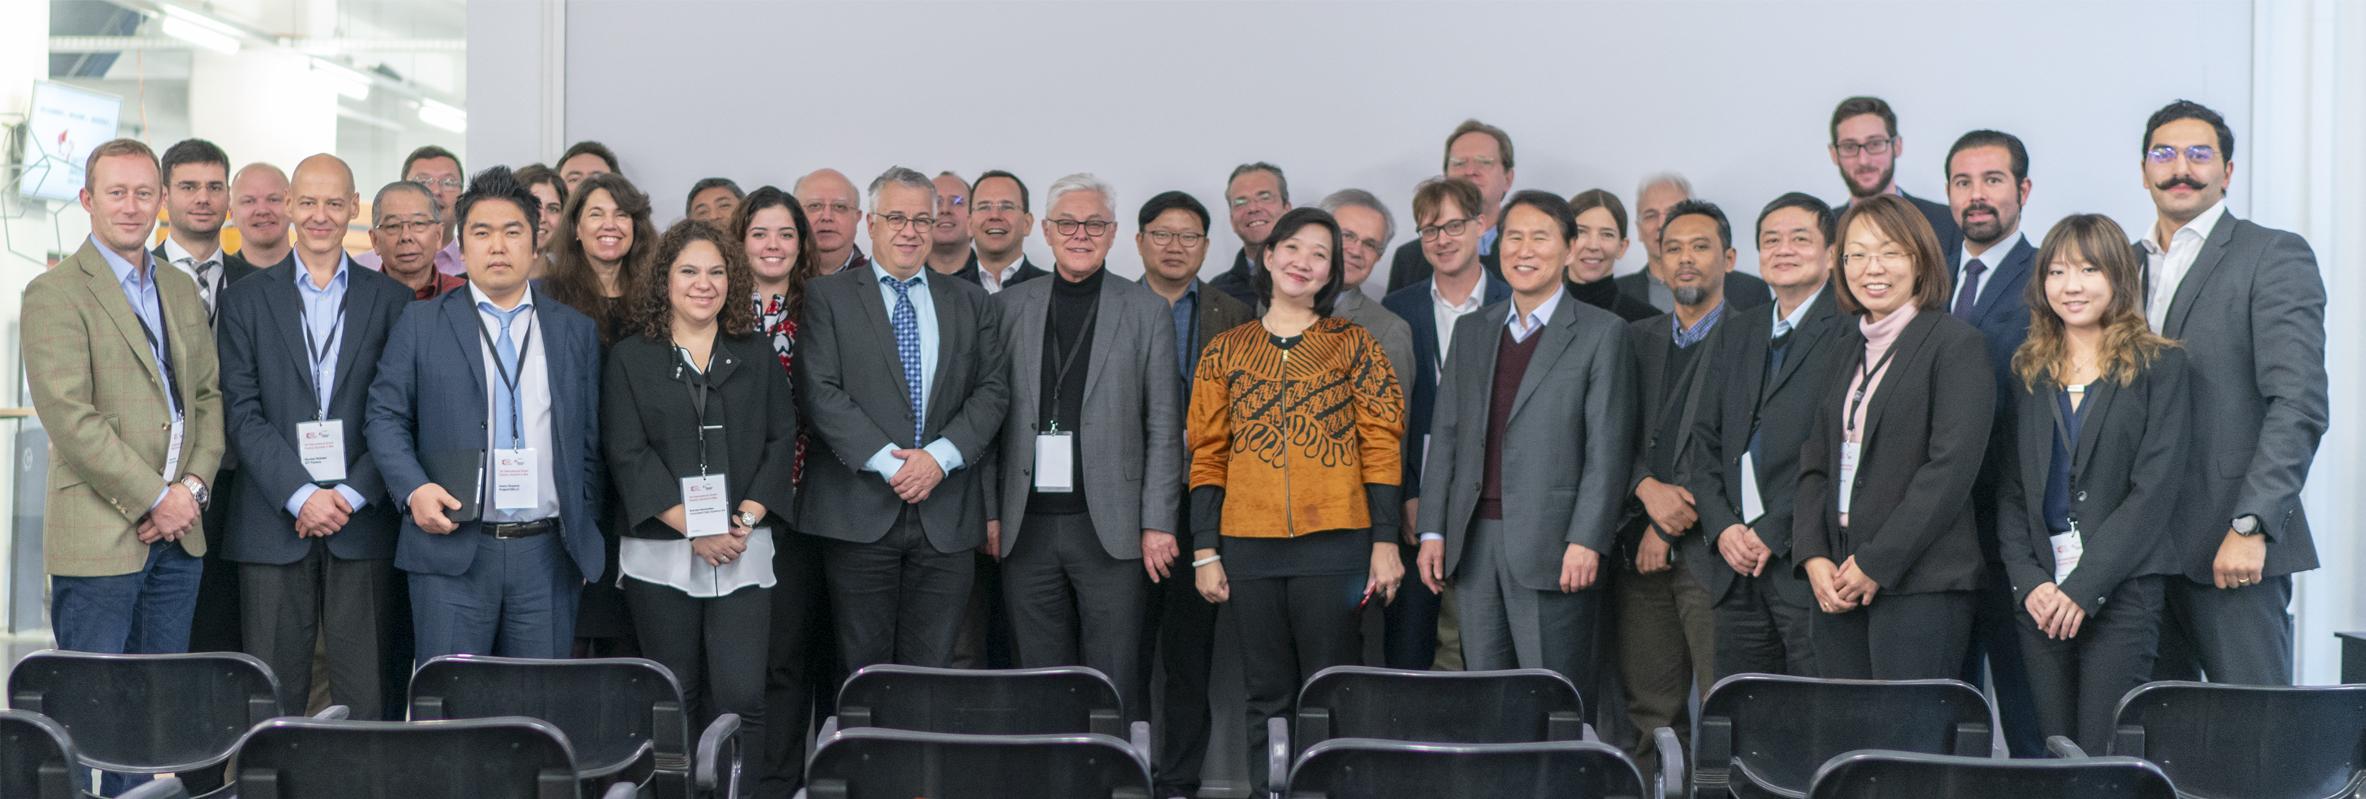 1st International Smart Factory Summit